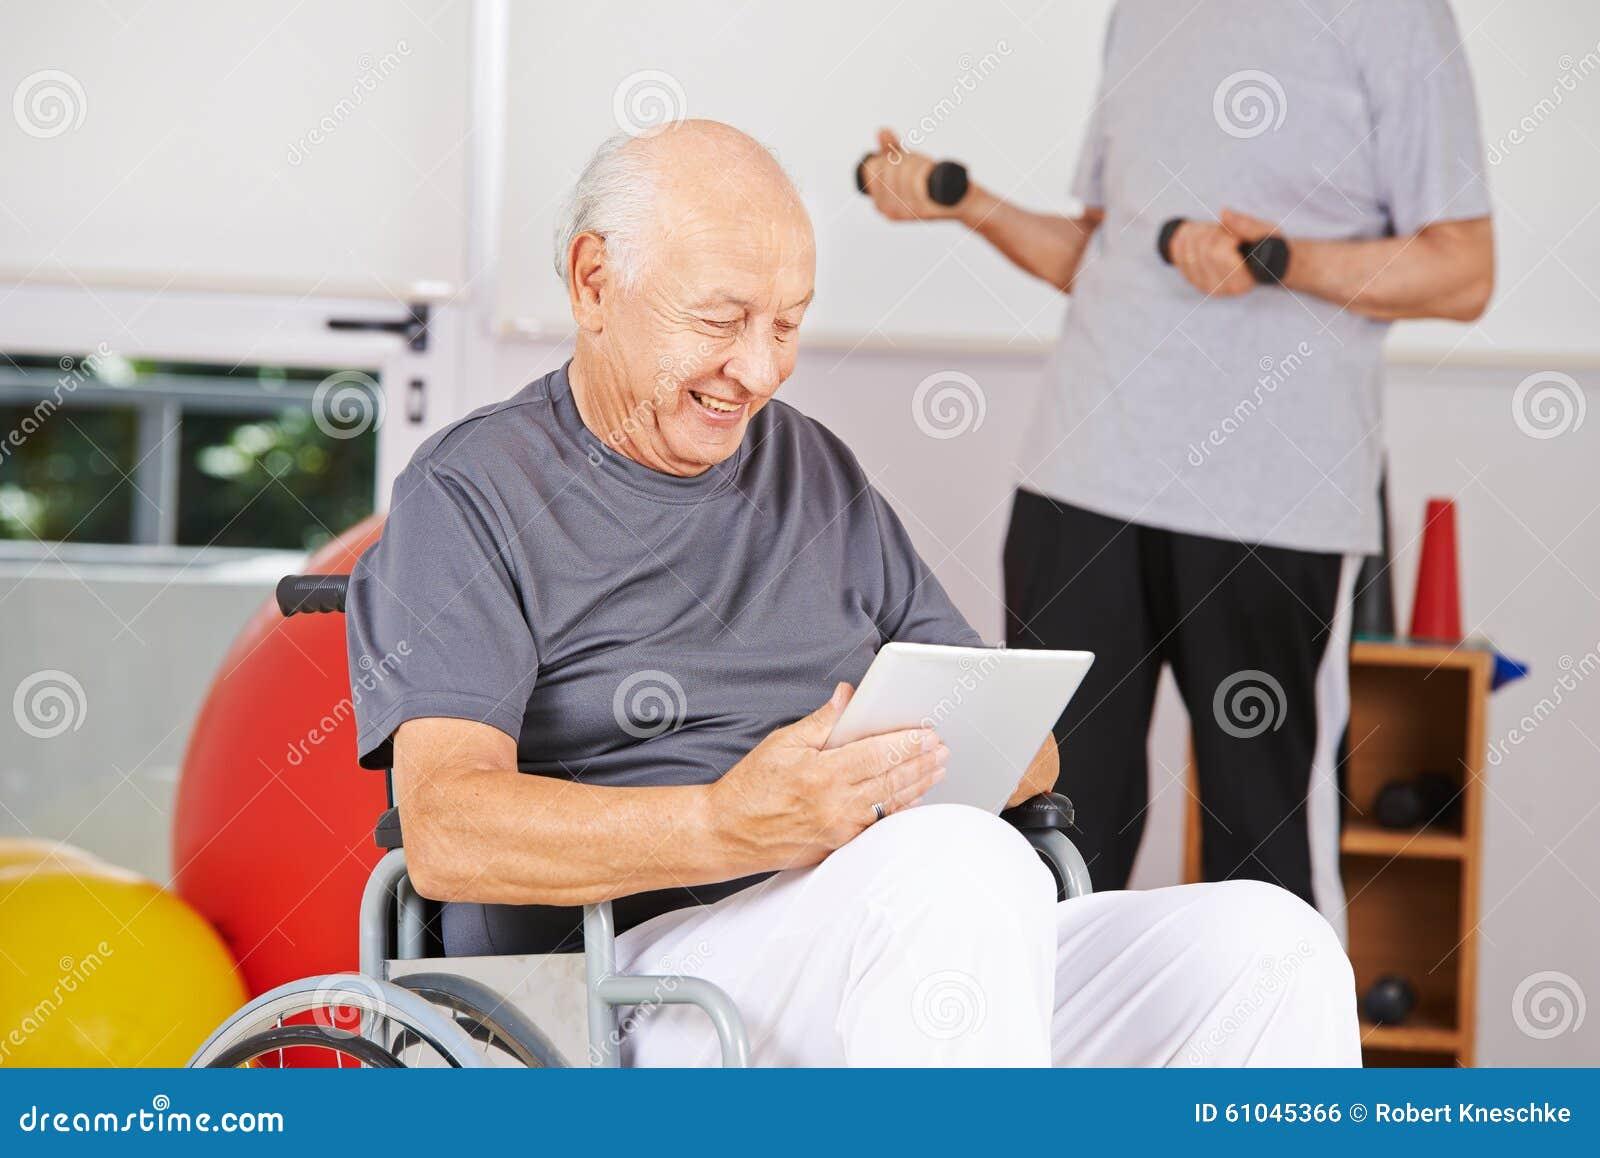 Old man care home horny senior bruce spots 3